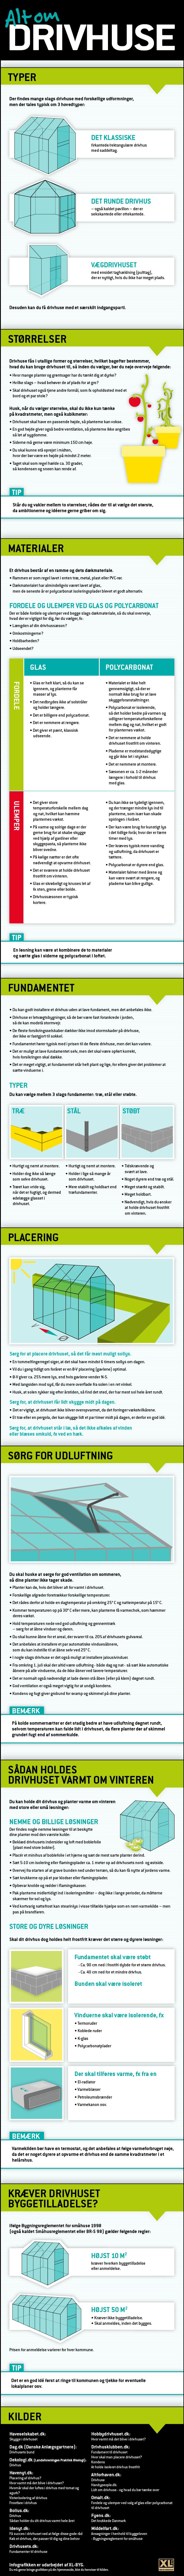 drivhuse-infografik_XL-Byg